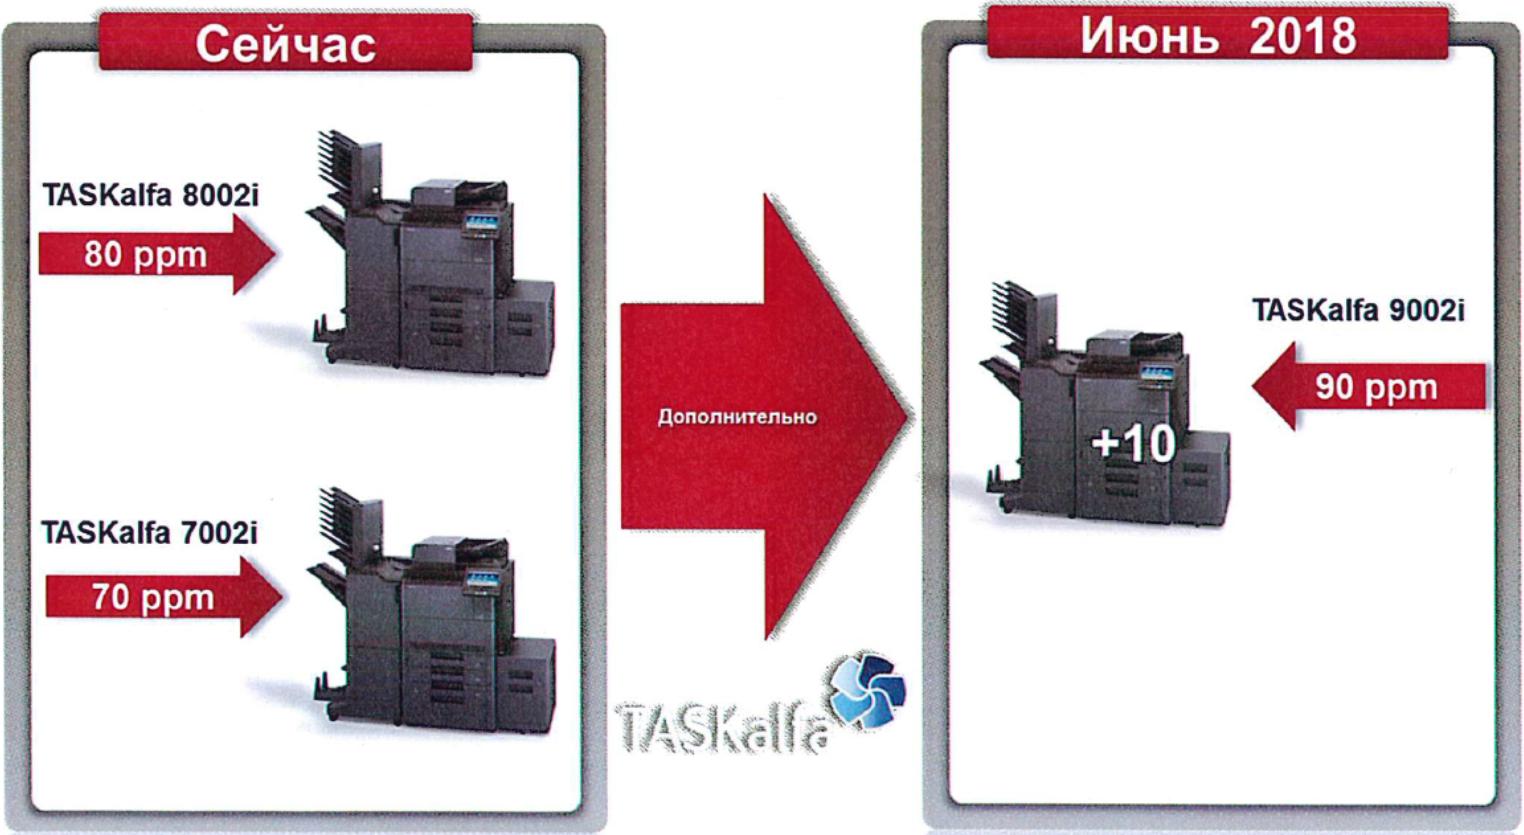 Запуск монохромных TASKalfa 9002i формата А3+ | БКС (Киосера)